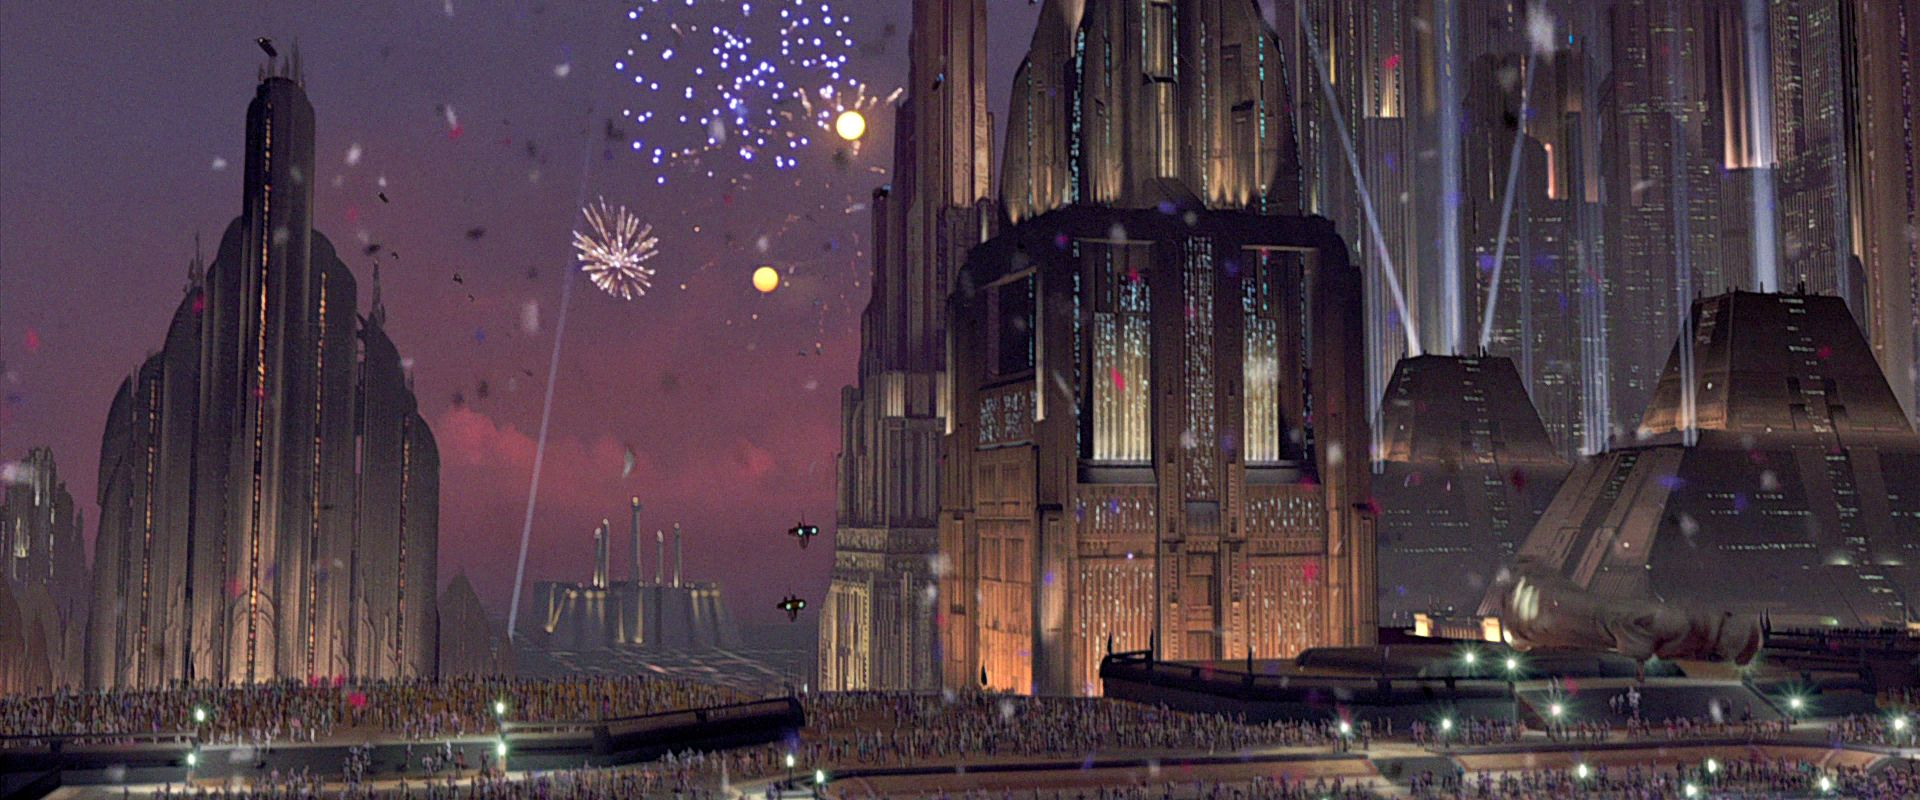 Future City Renderings Art Skyscrapercity Star Wars Planets Star Wars Artwork Star Wars